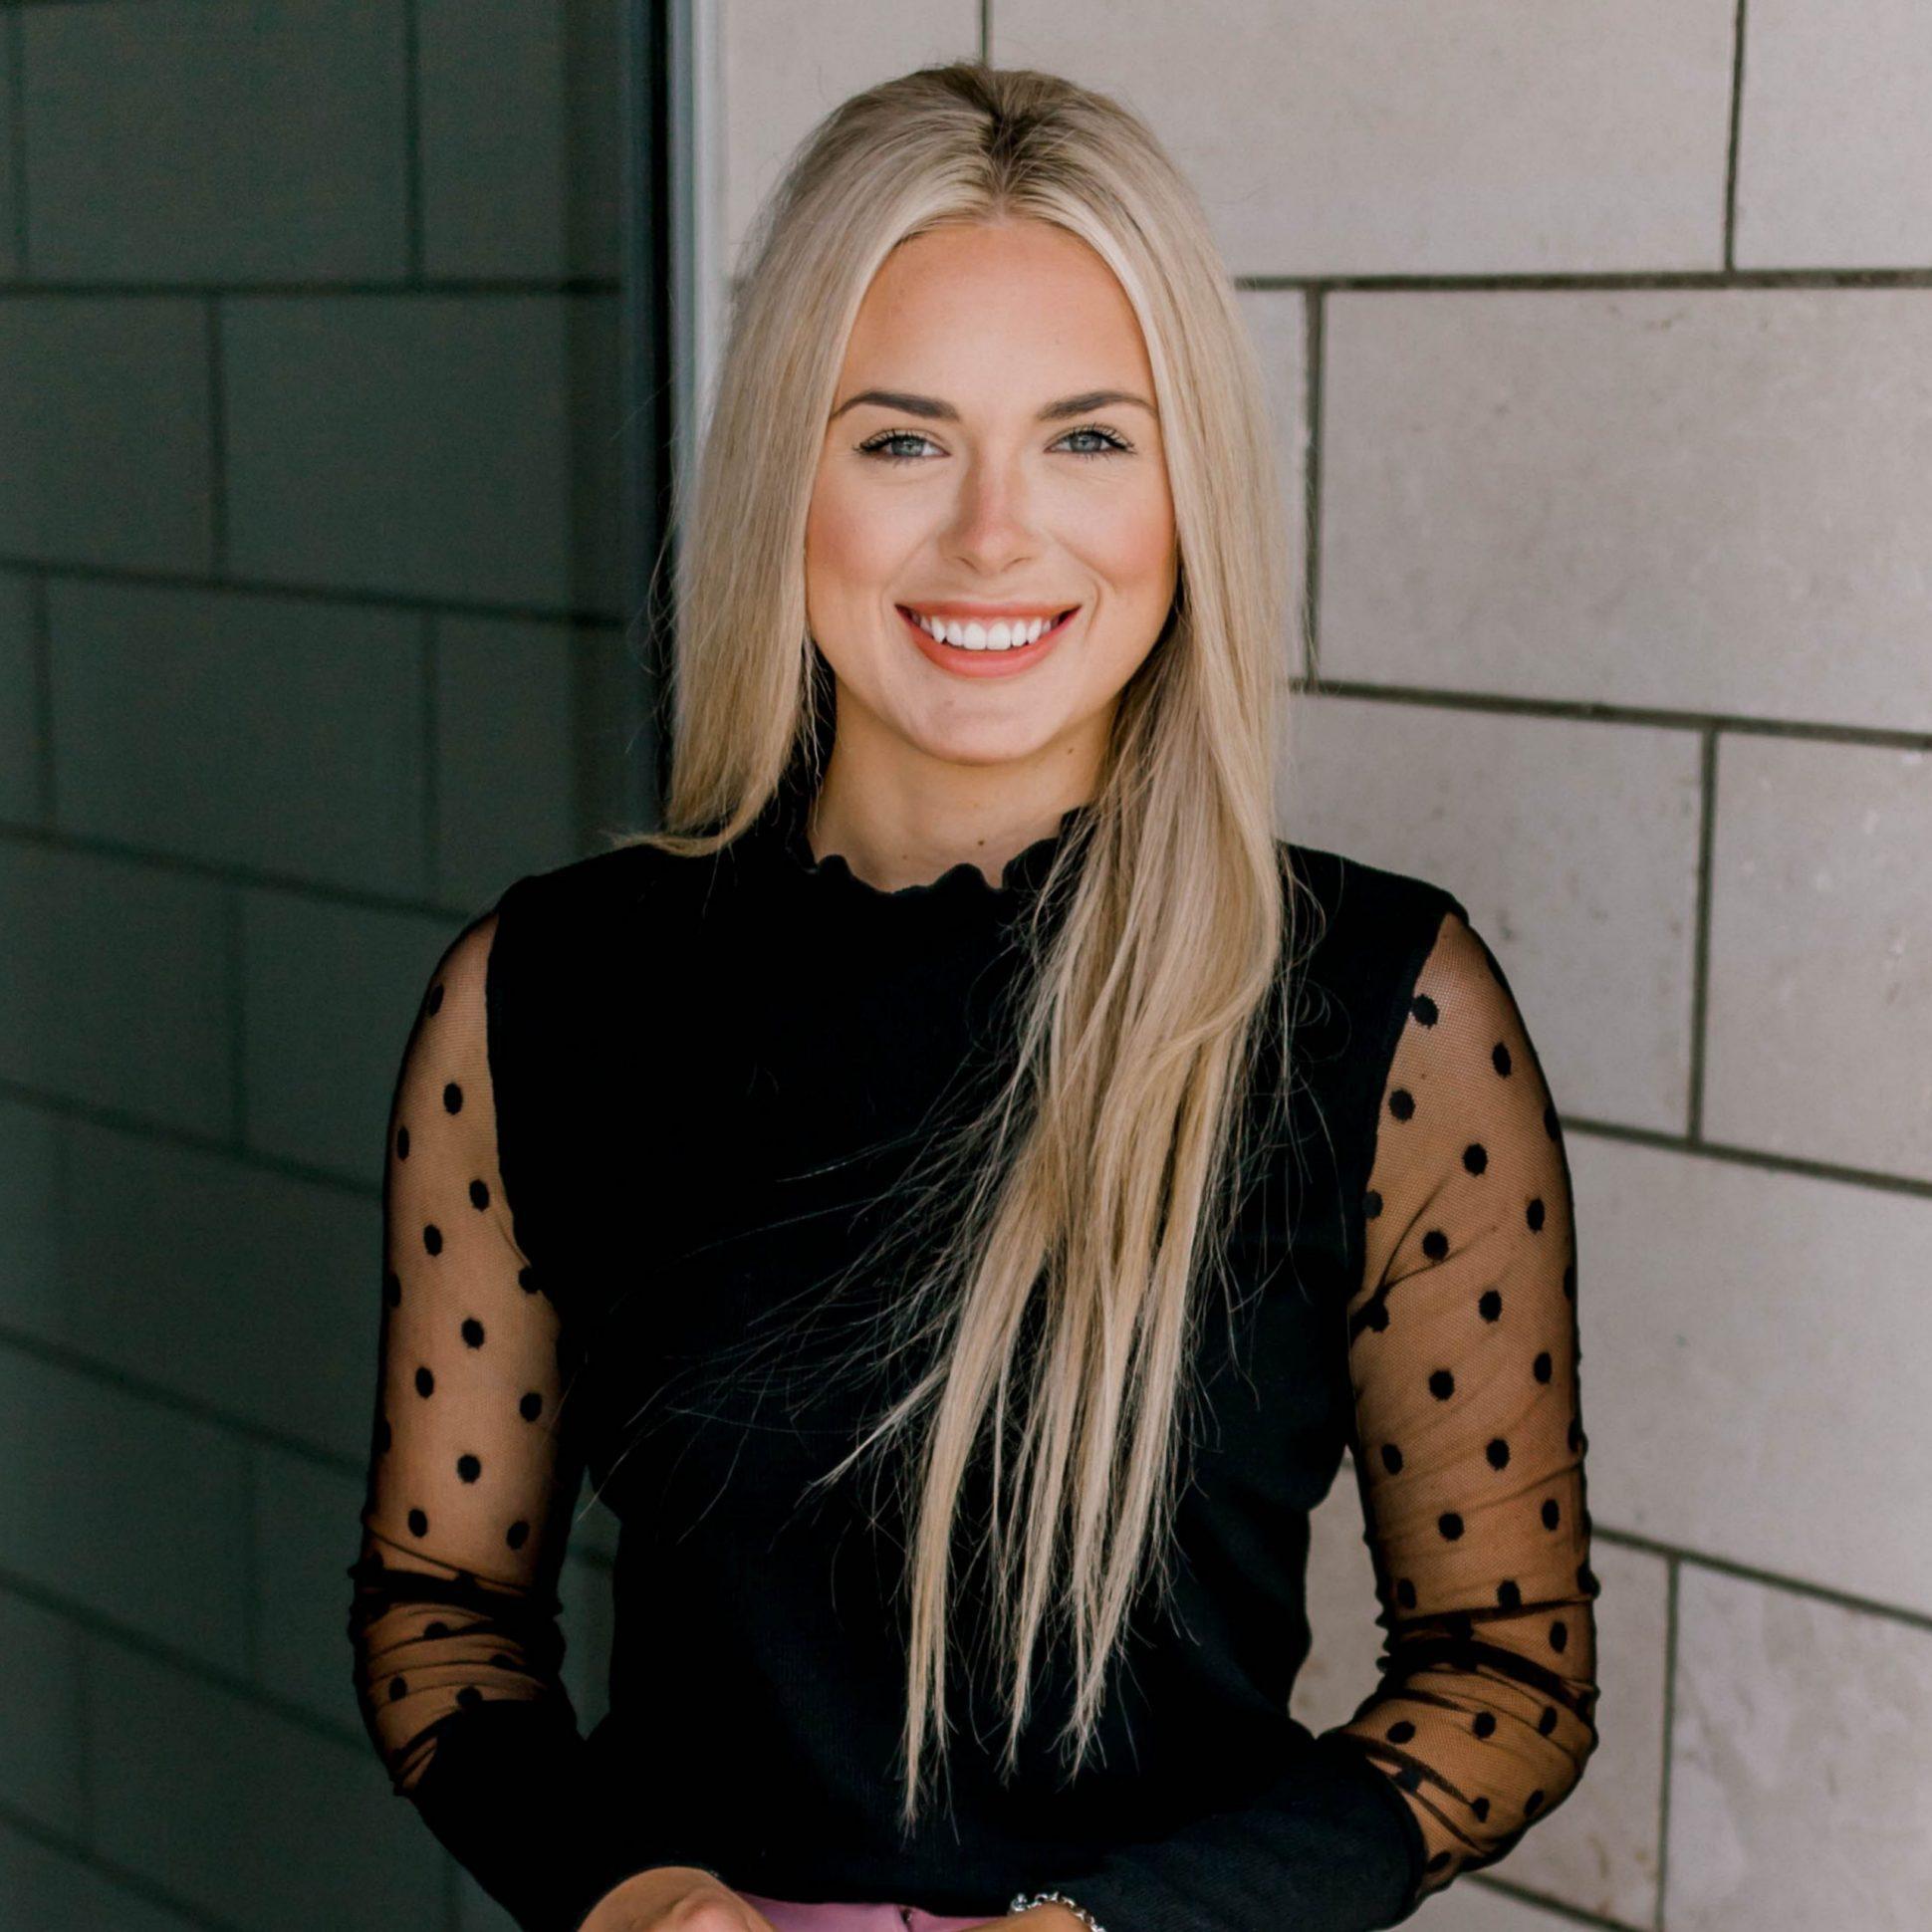 Emma Fortier